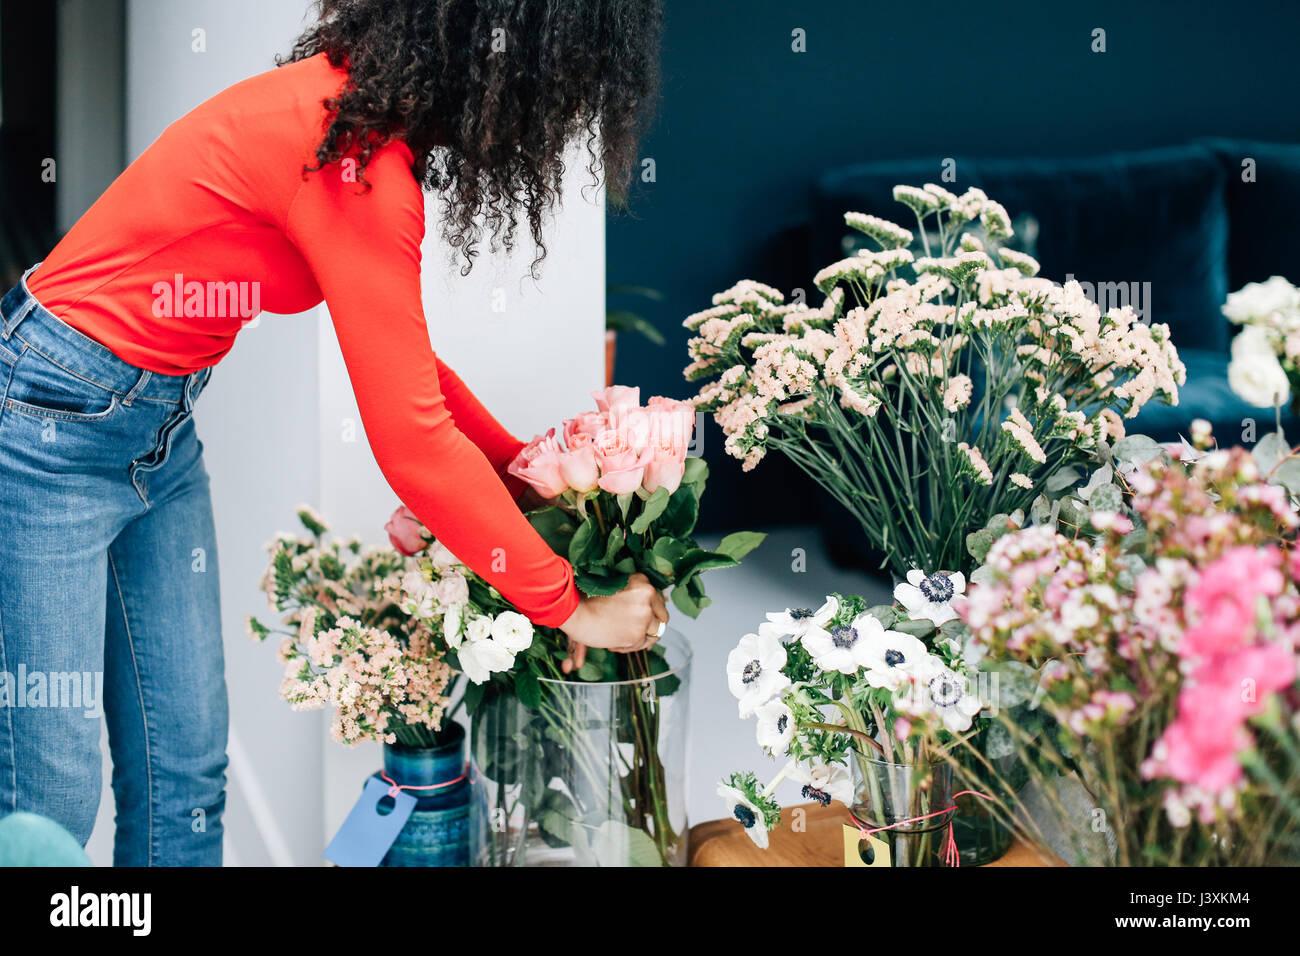 Female florist arranging roses in vase for shop display - Stock Image